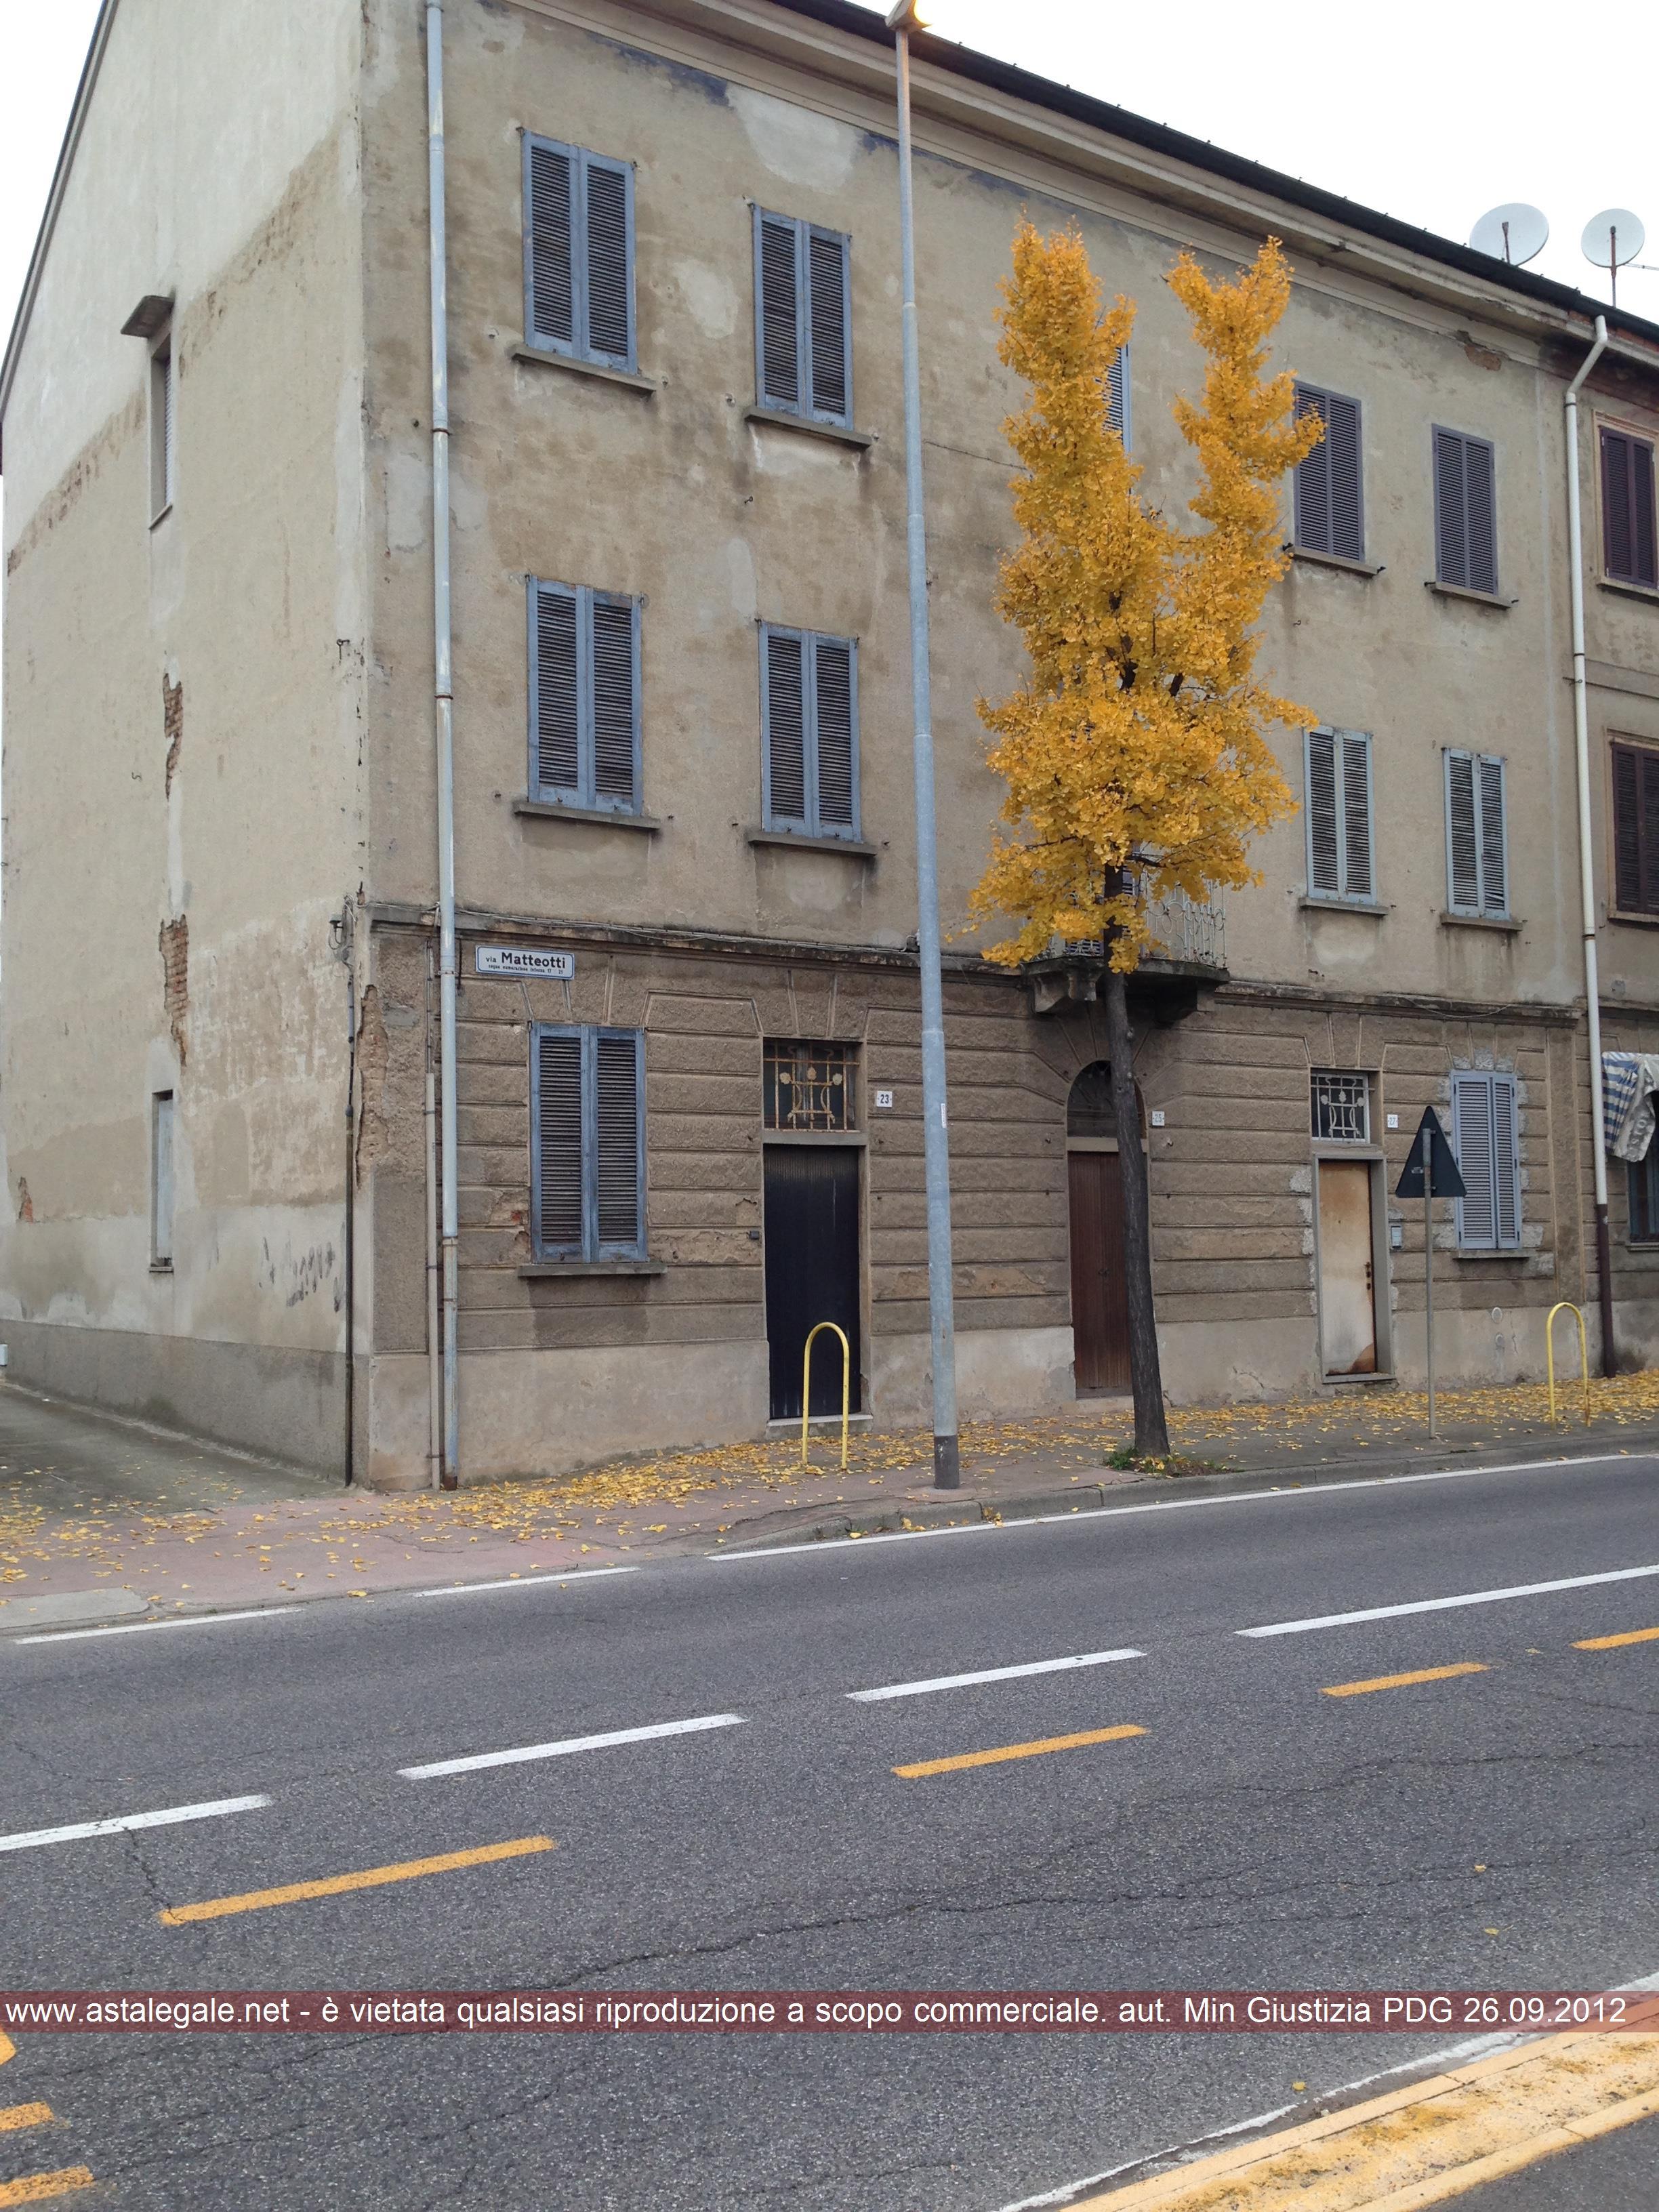 Bernareggio (MB) Via Matteotti 21